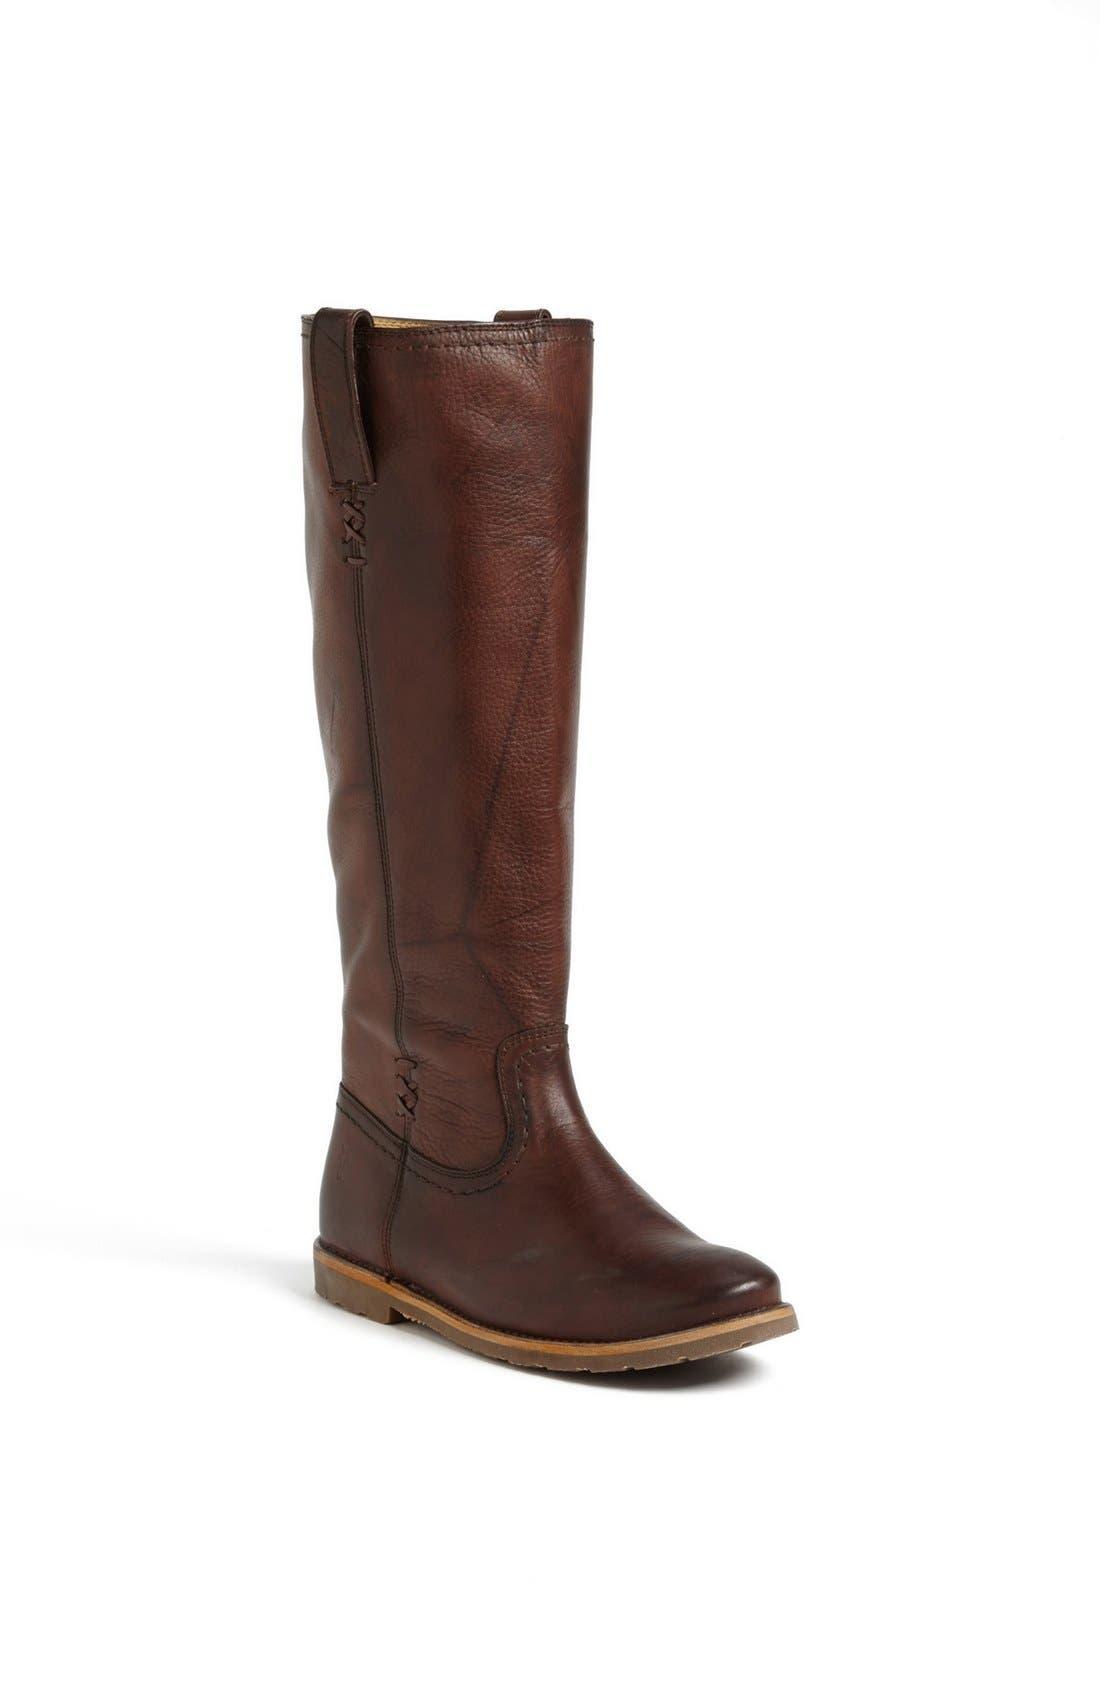 Alternate Image 1 Selected - Frye 'Celia' Boot